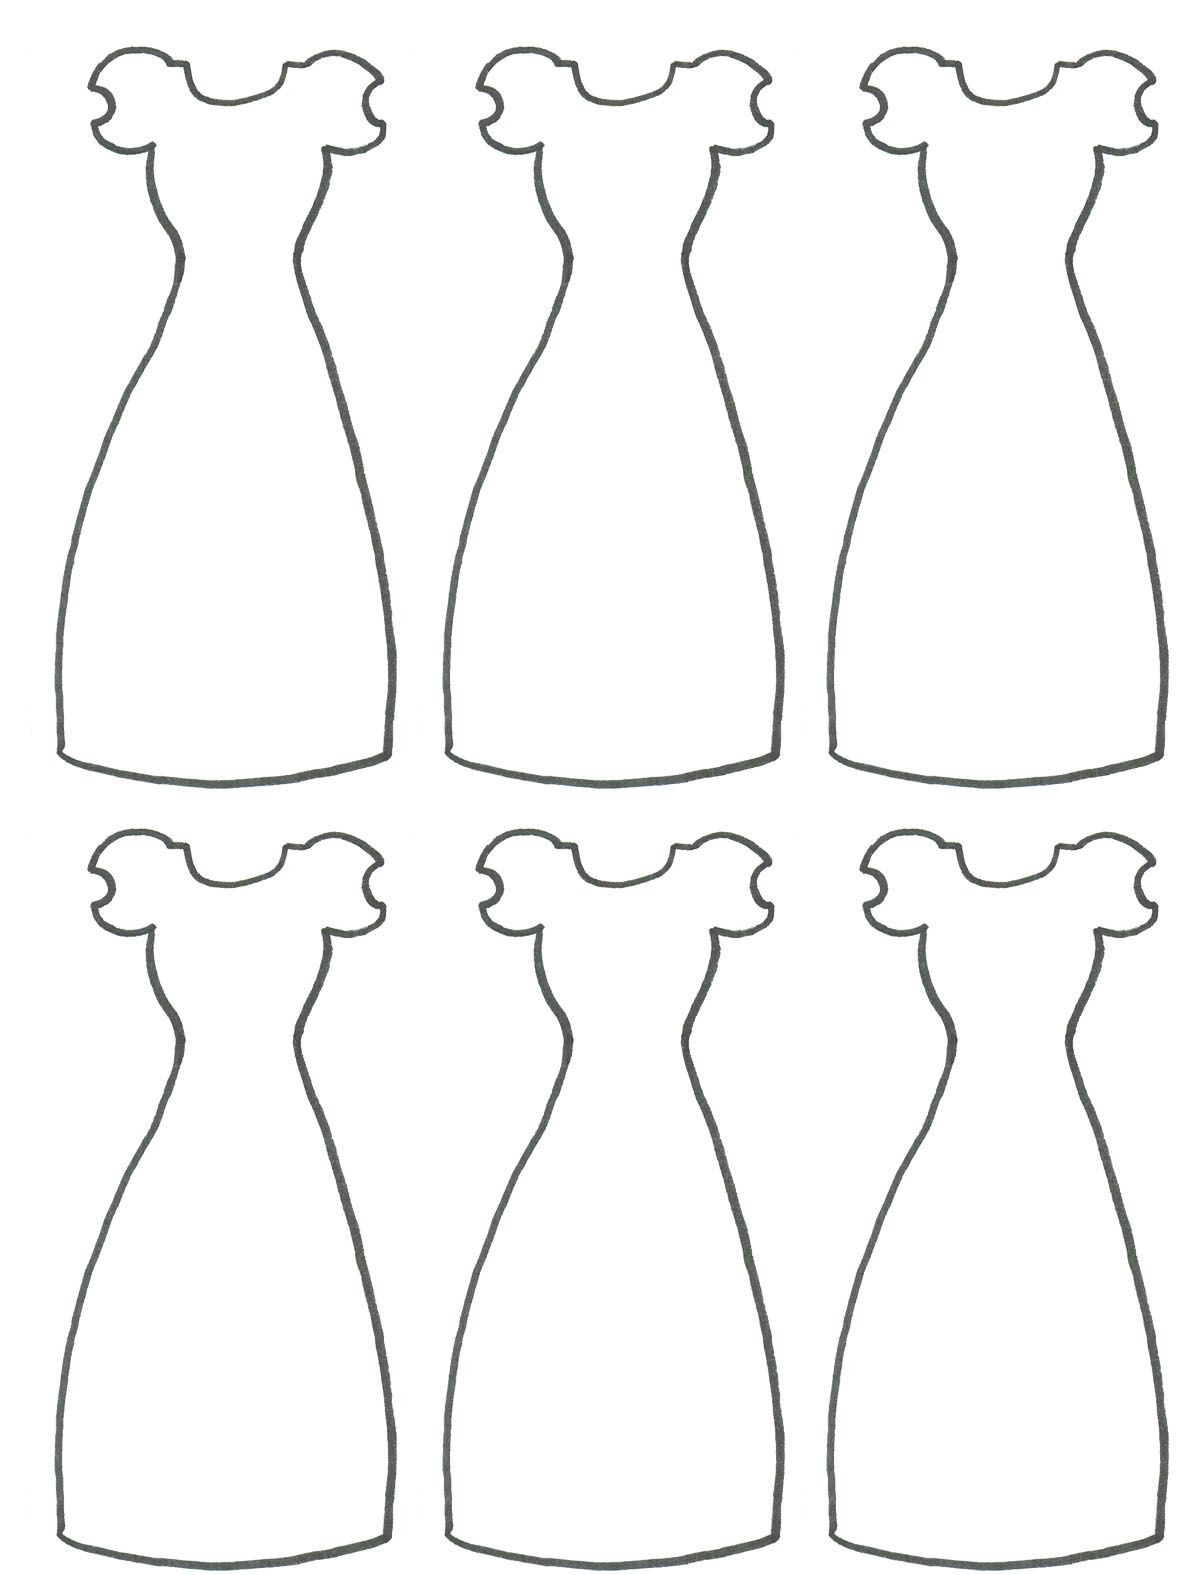 Beautiful Dress Coloring Page Rajzra Pinterest Design A Dress Games Girl Dress Coloring Page Girl Girls Design A Dress